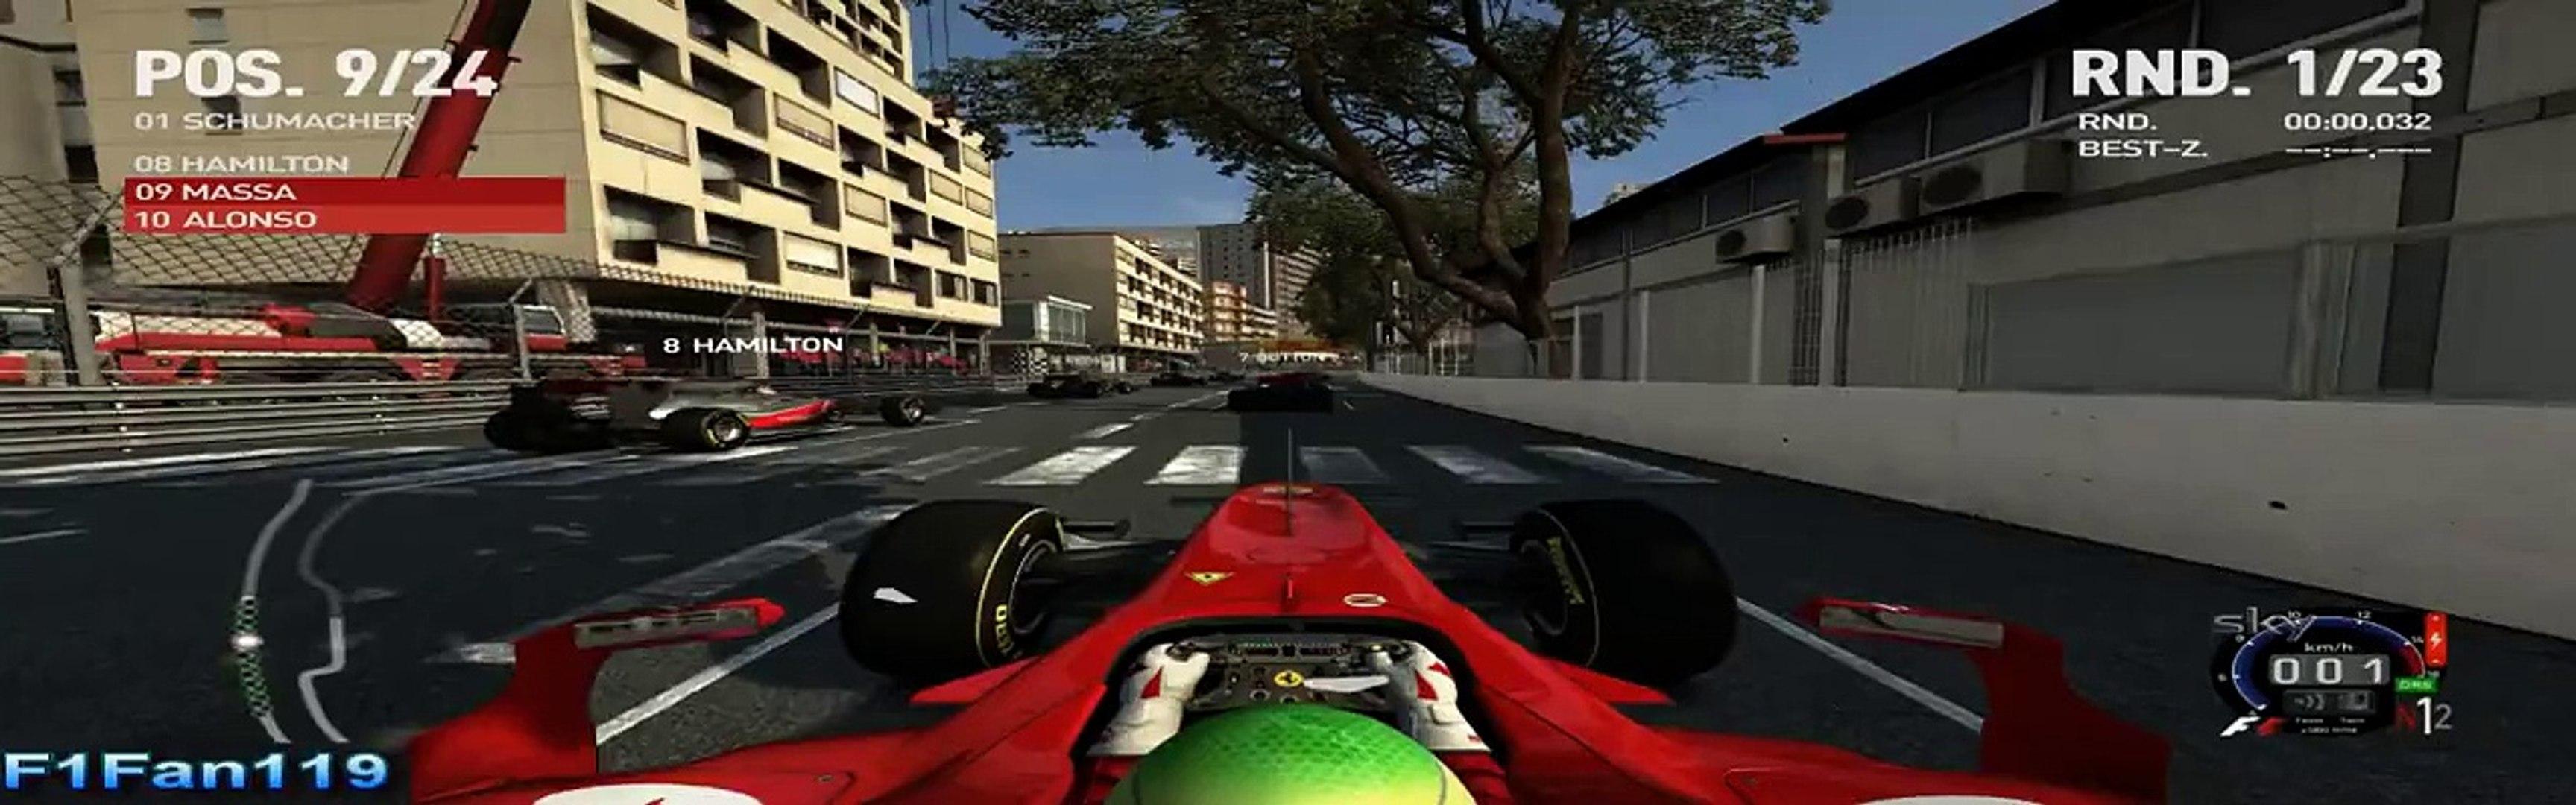 F1 2011 Mod 2 0 (Upgrade) + New HUD for F1 2010 [HD]